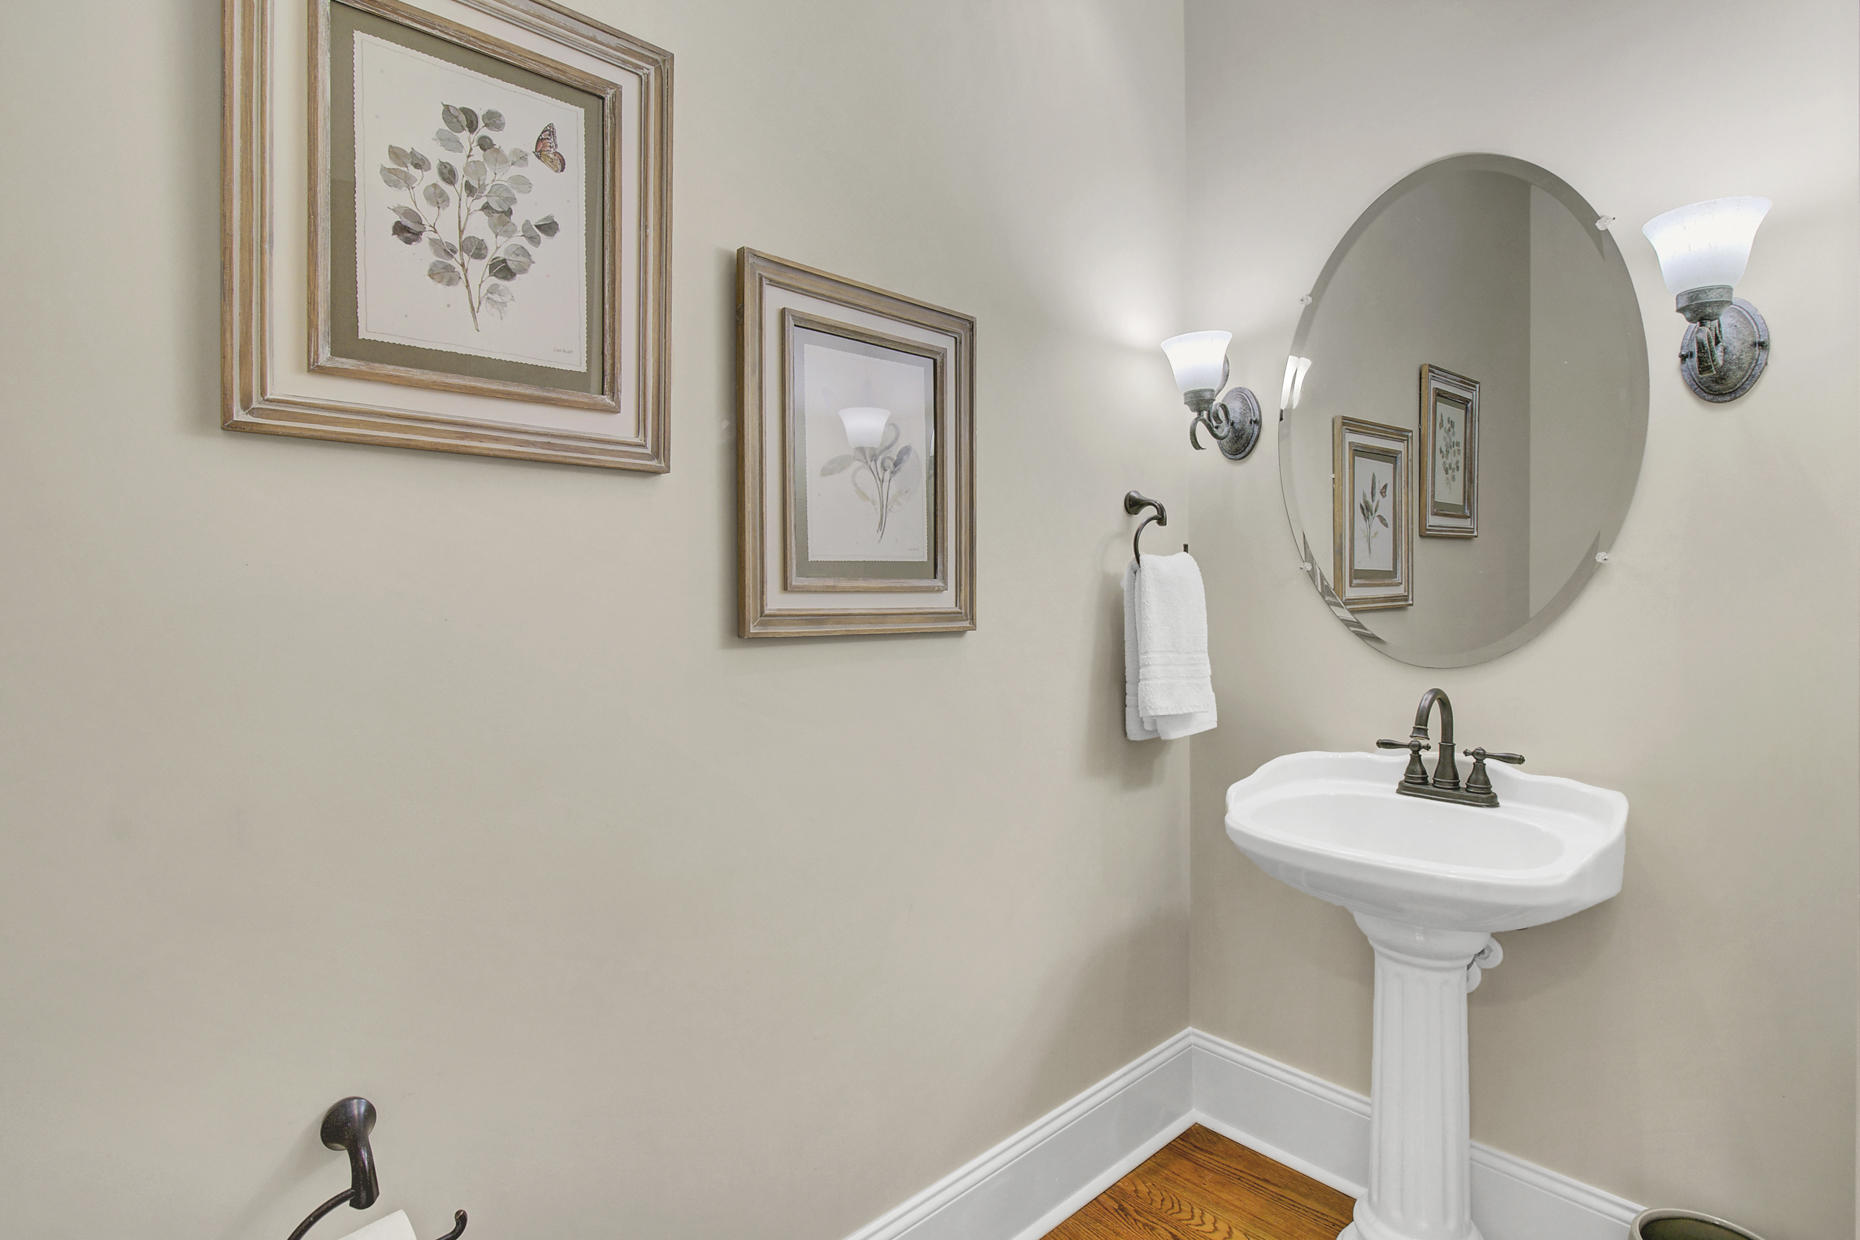 Dunes West Homes For Sale - 4123 Colonel Vanderhorst, Mount Pleasant, SC - 5